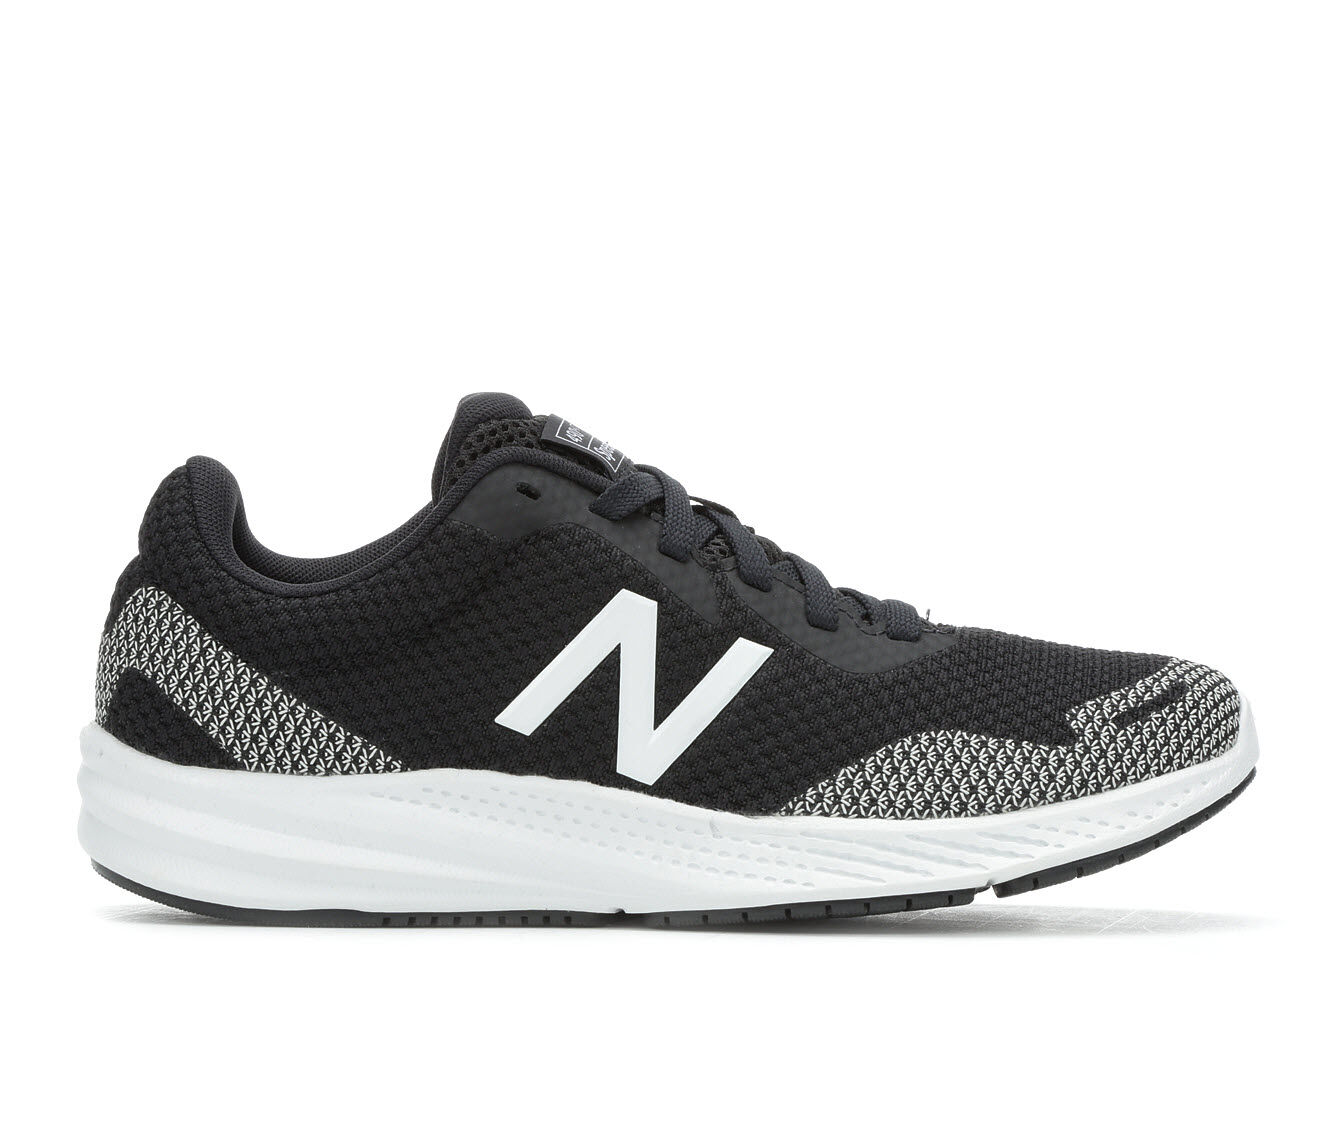 New Balance W490V7 Running Shoes